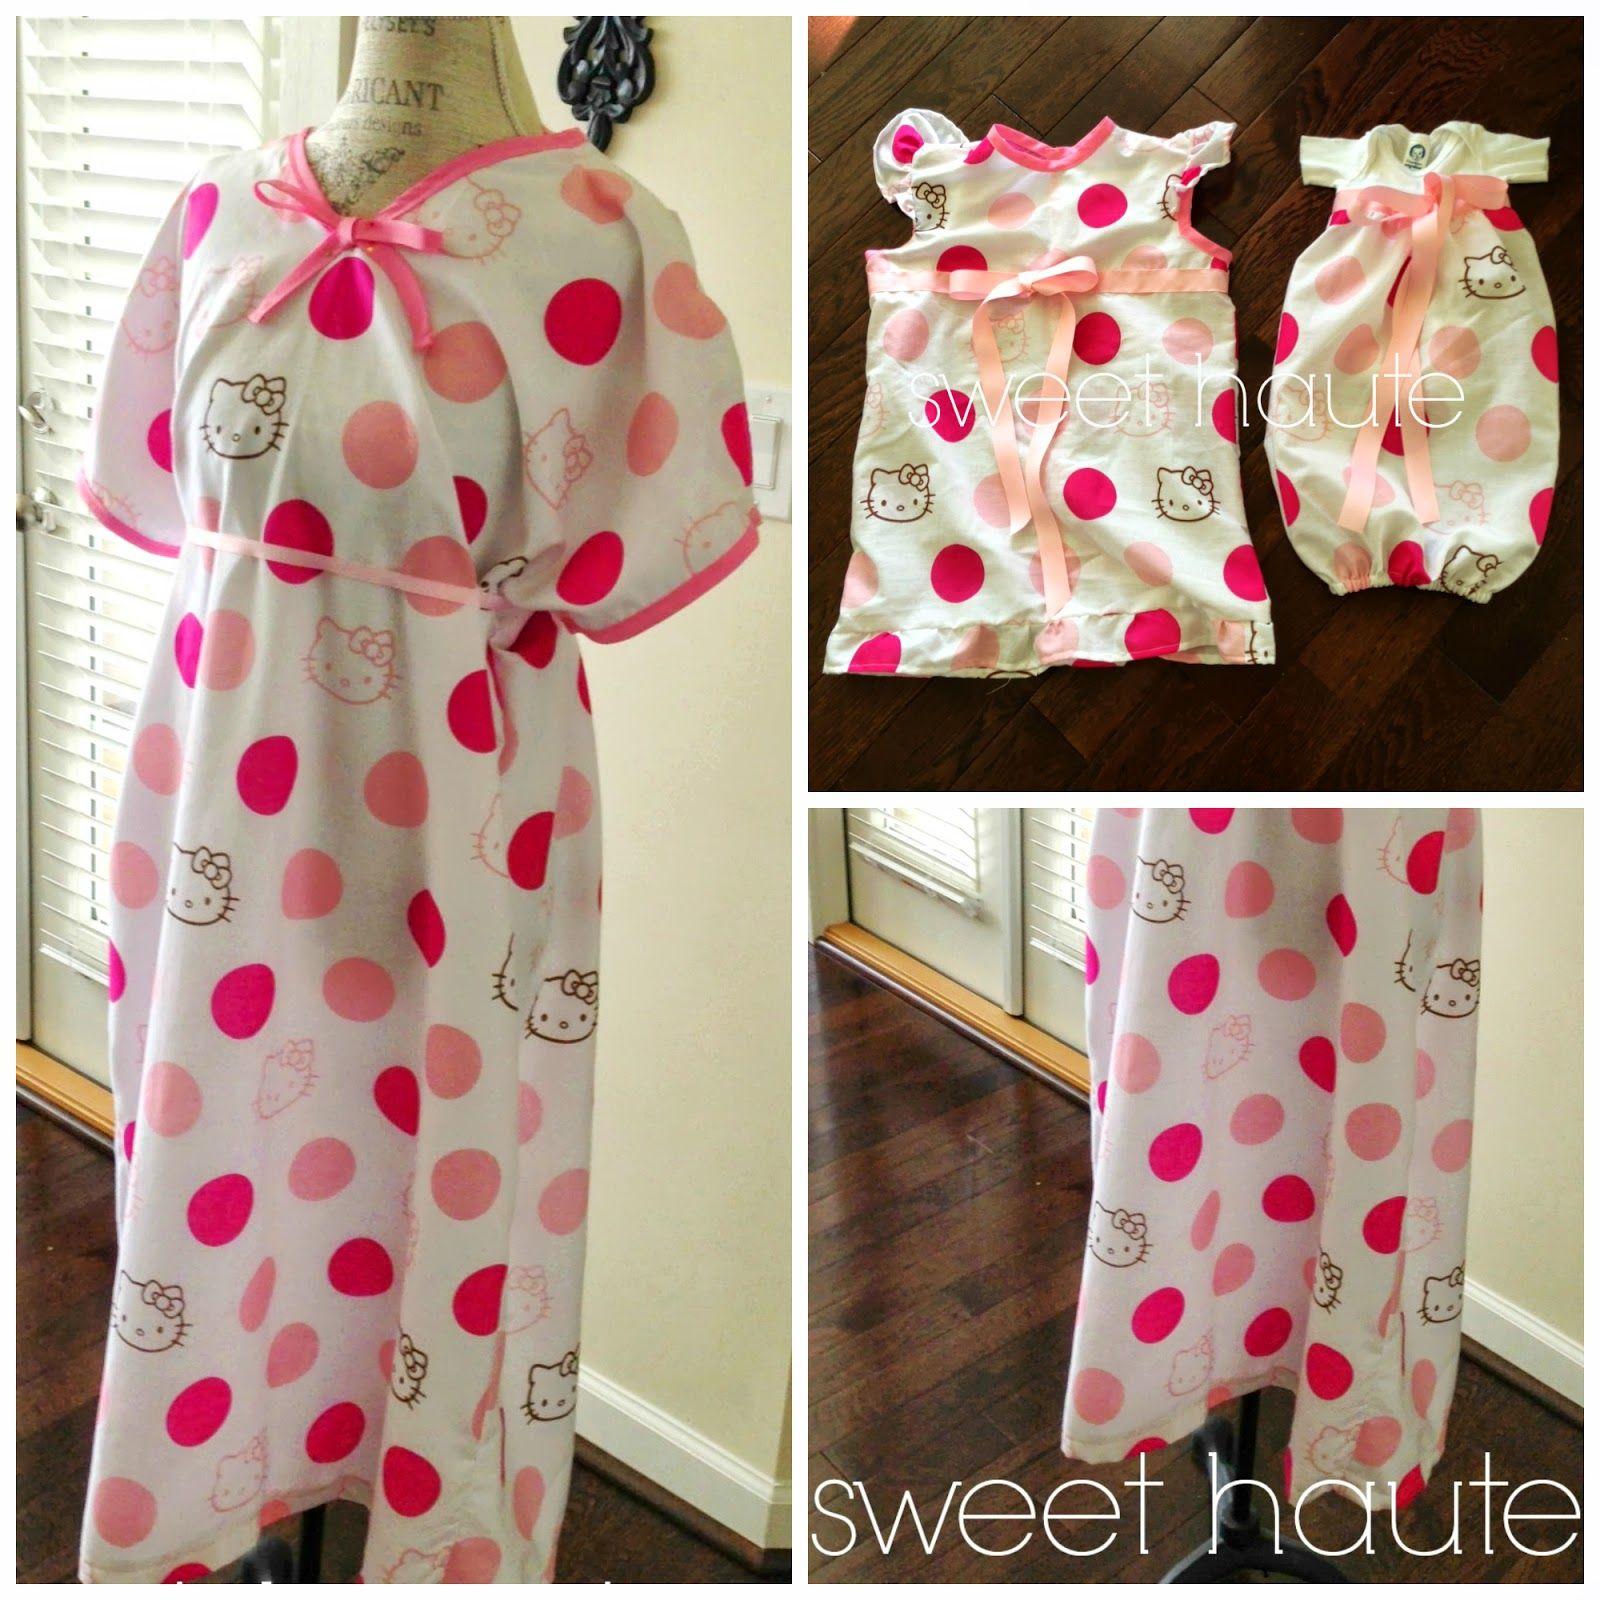 SWEET HAUTE*: DIY Maternity Hospital Gown- FREE Pattern | Pregnancy ...